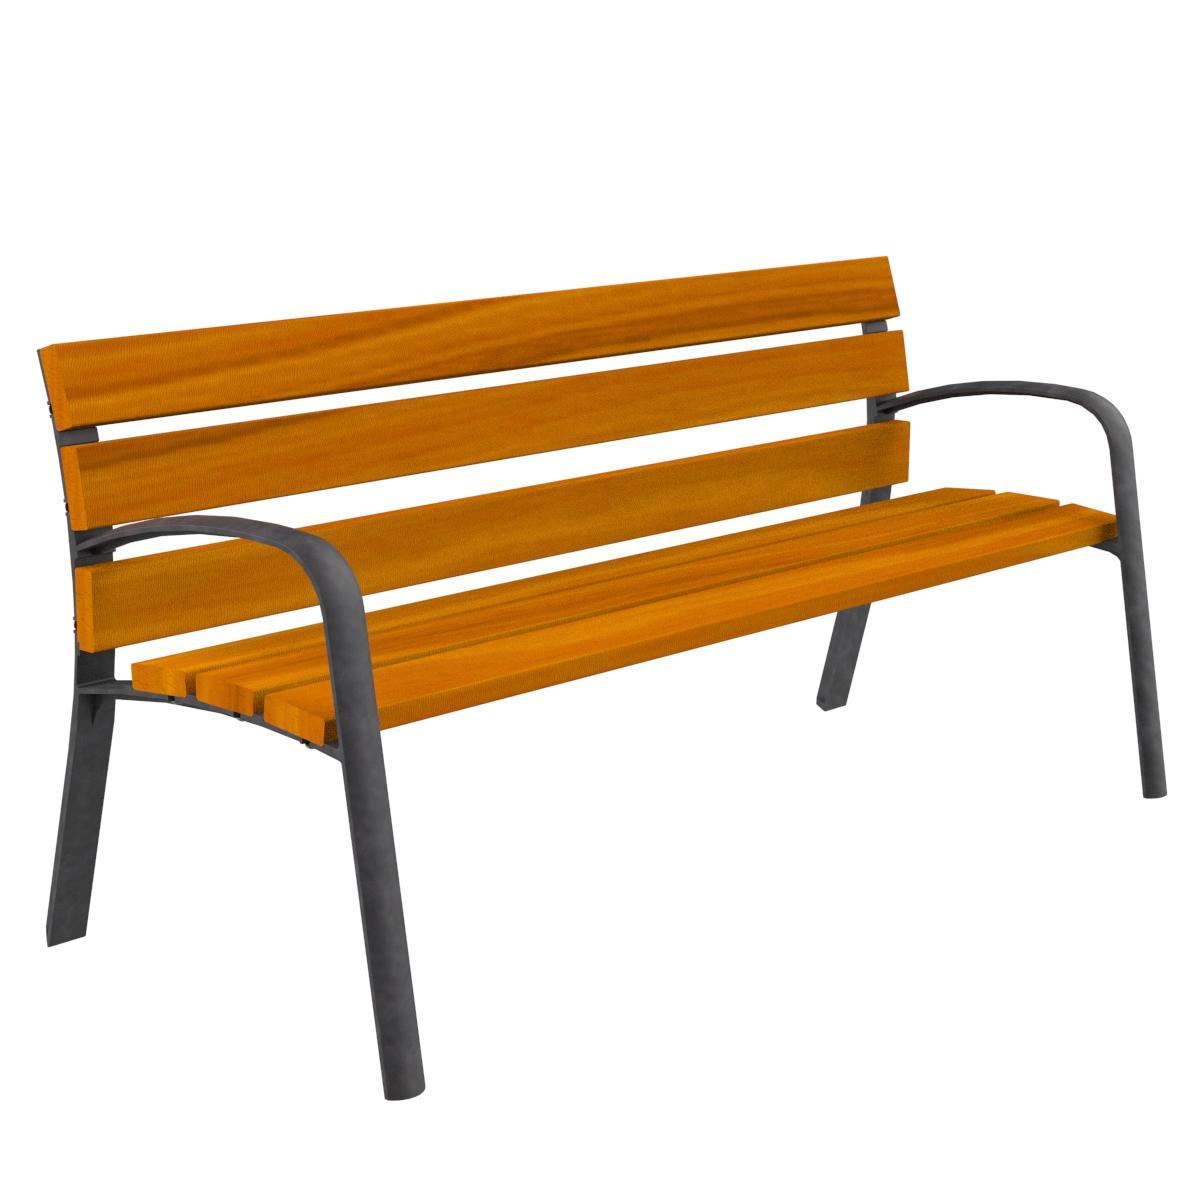 Banco madera modo mobiliario urbano para sentarse parques for Banco madera jardin